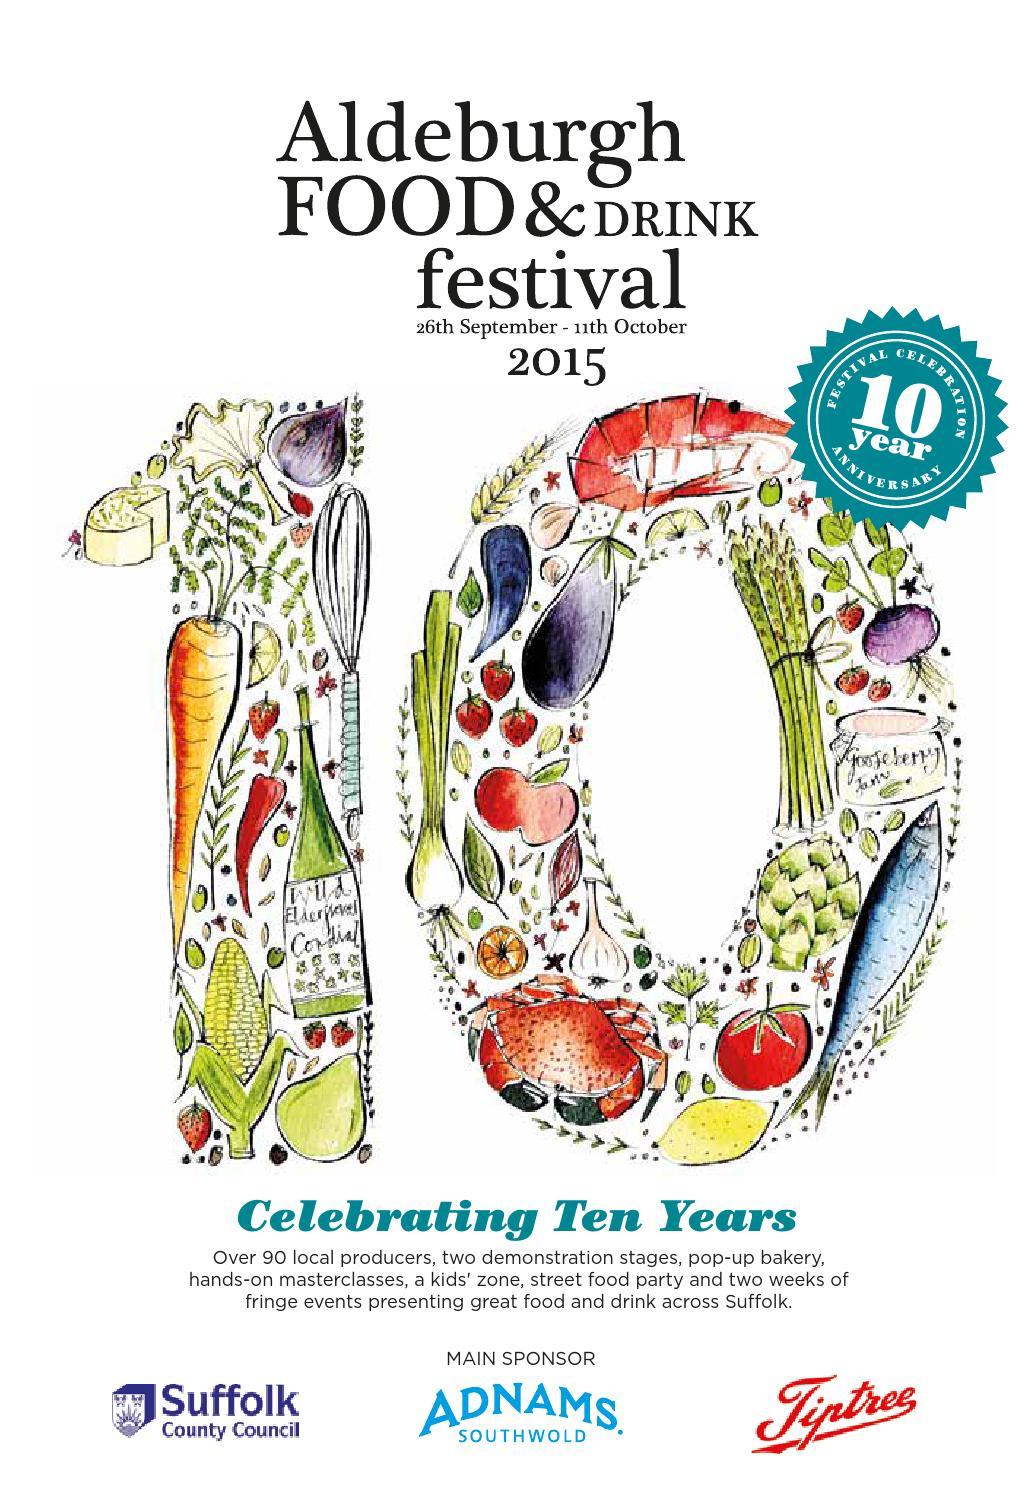 Aldeburgh Food Festival Exhibitors